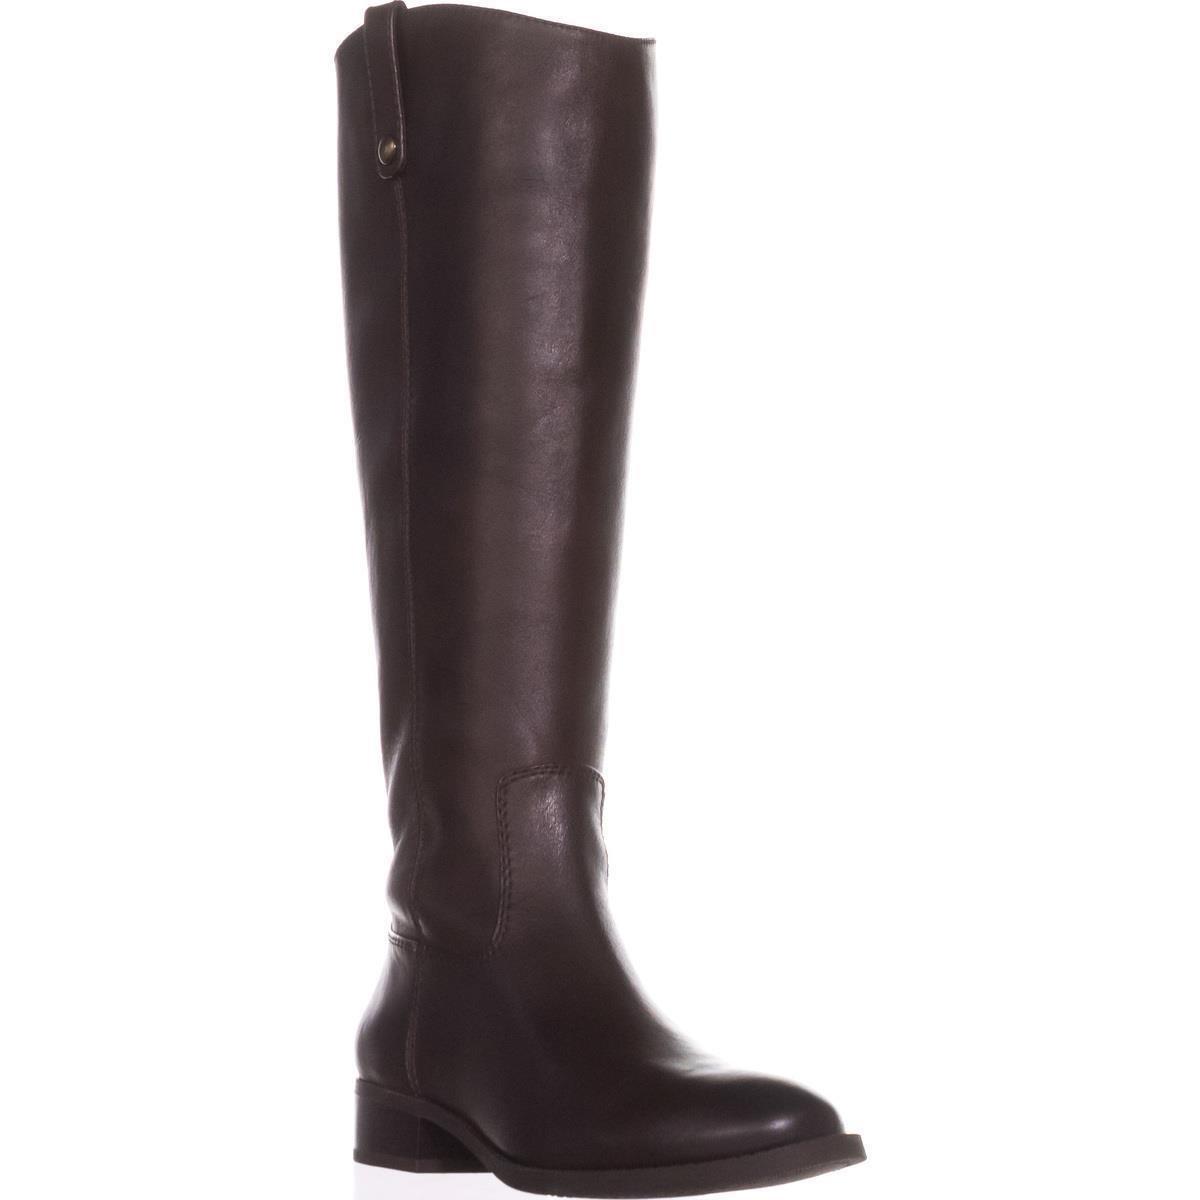 Chocolate INC International Concepts Womens fawme Closed Toe Knee High Fashion Boots